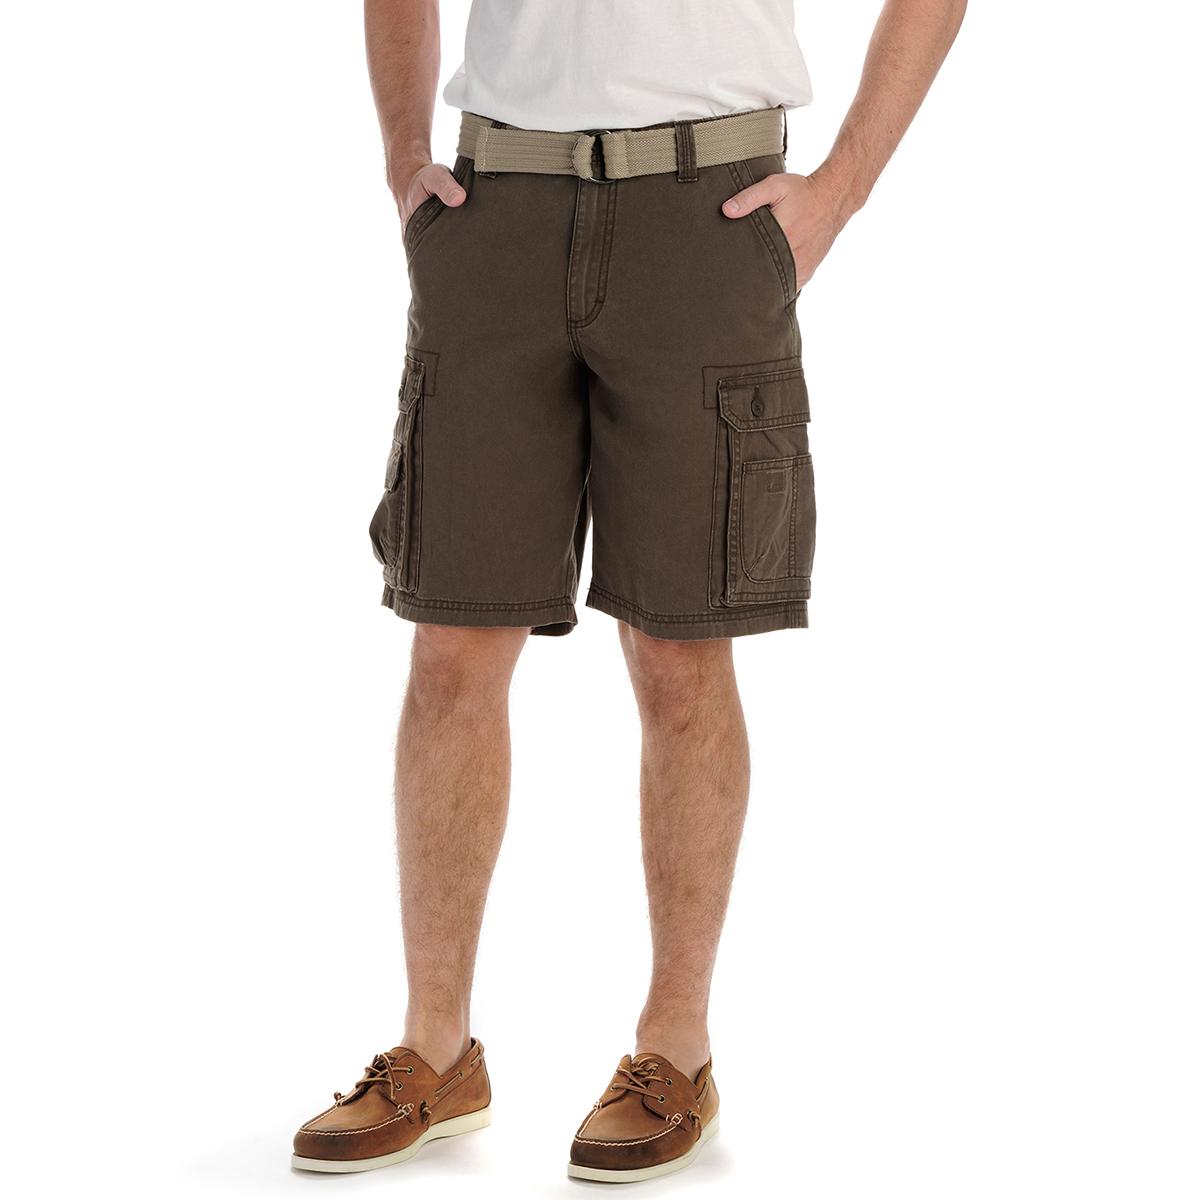 LEE Men's Dungarees Wyoming Twill Cargo Shorts - Black, 30